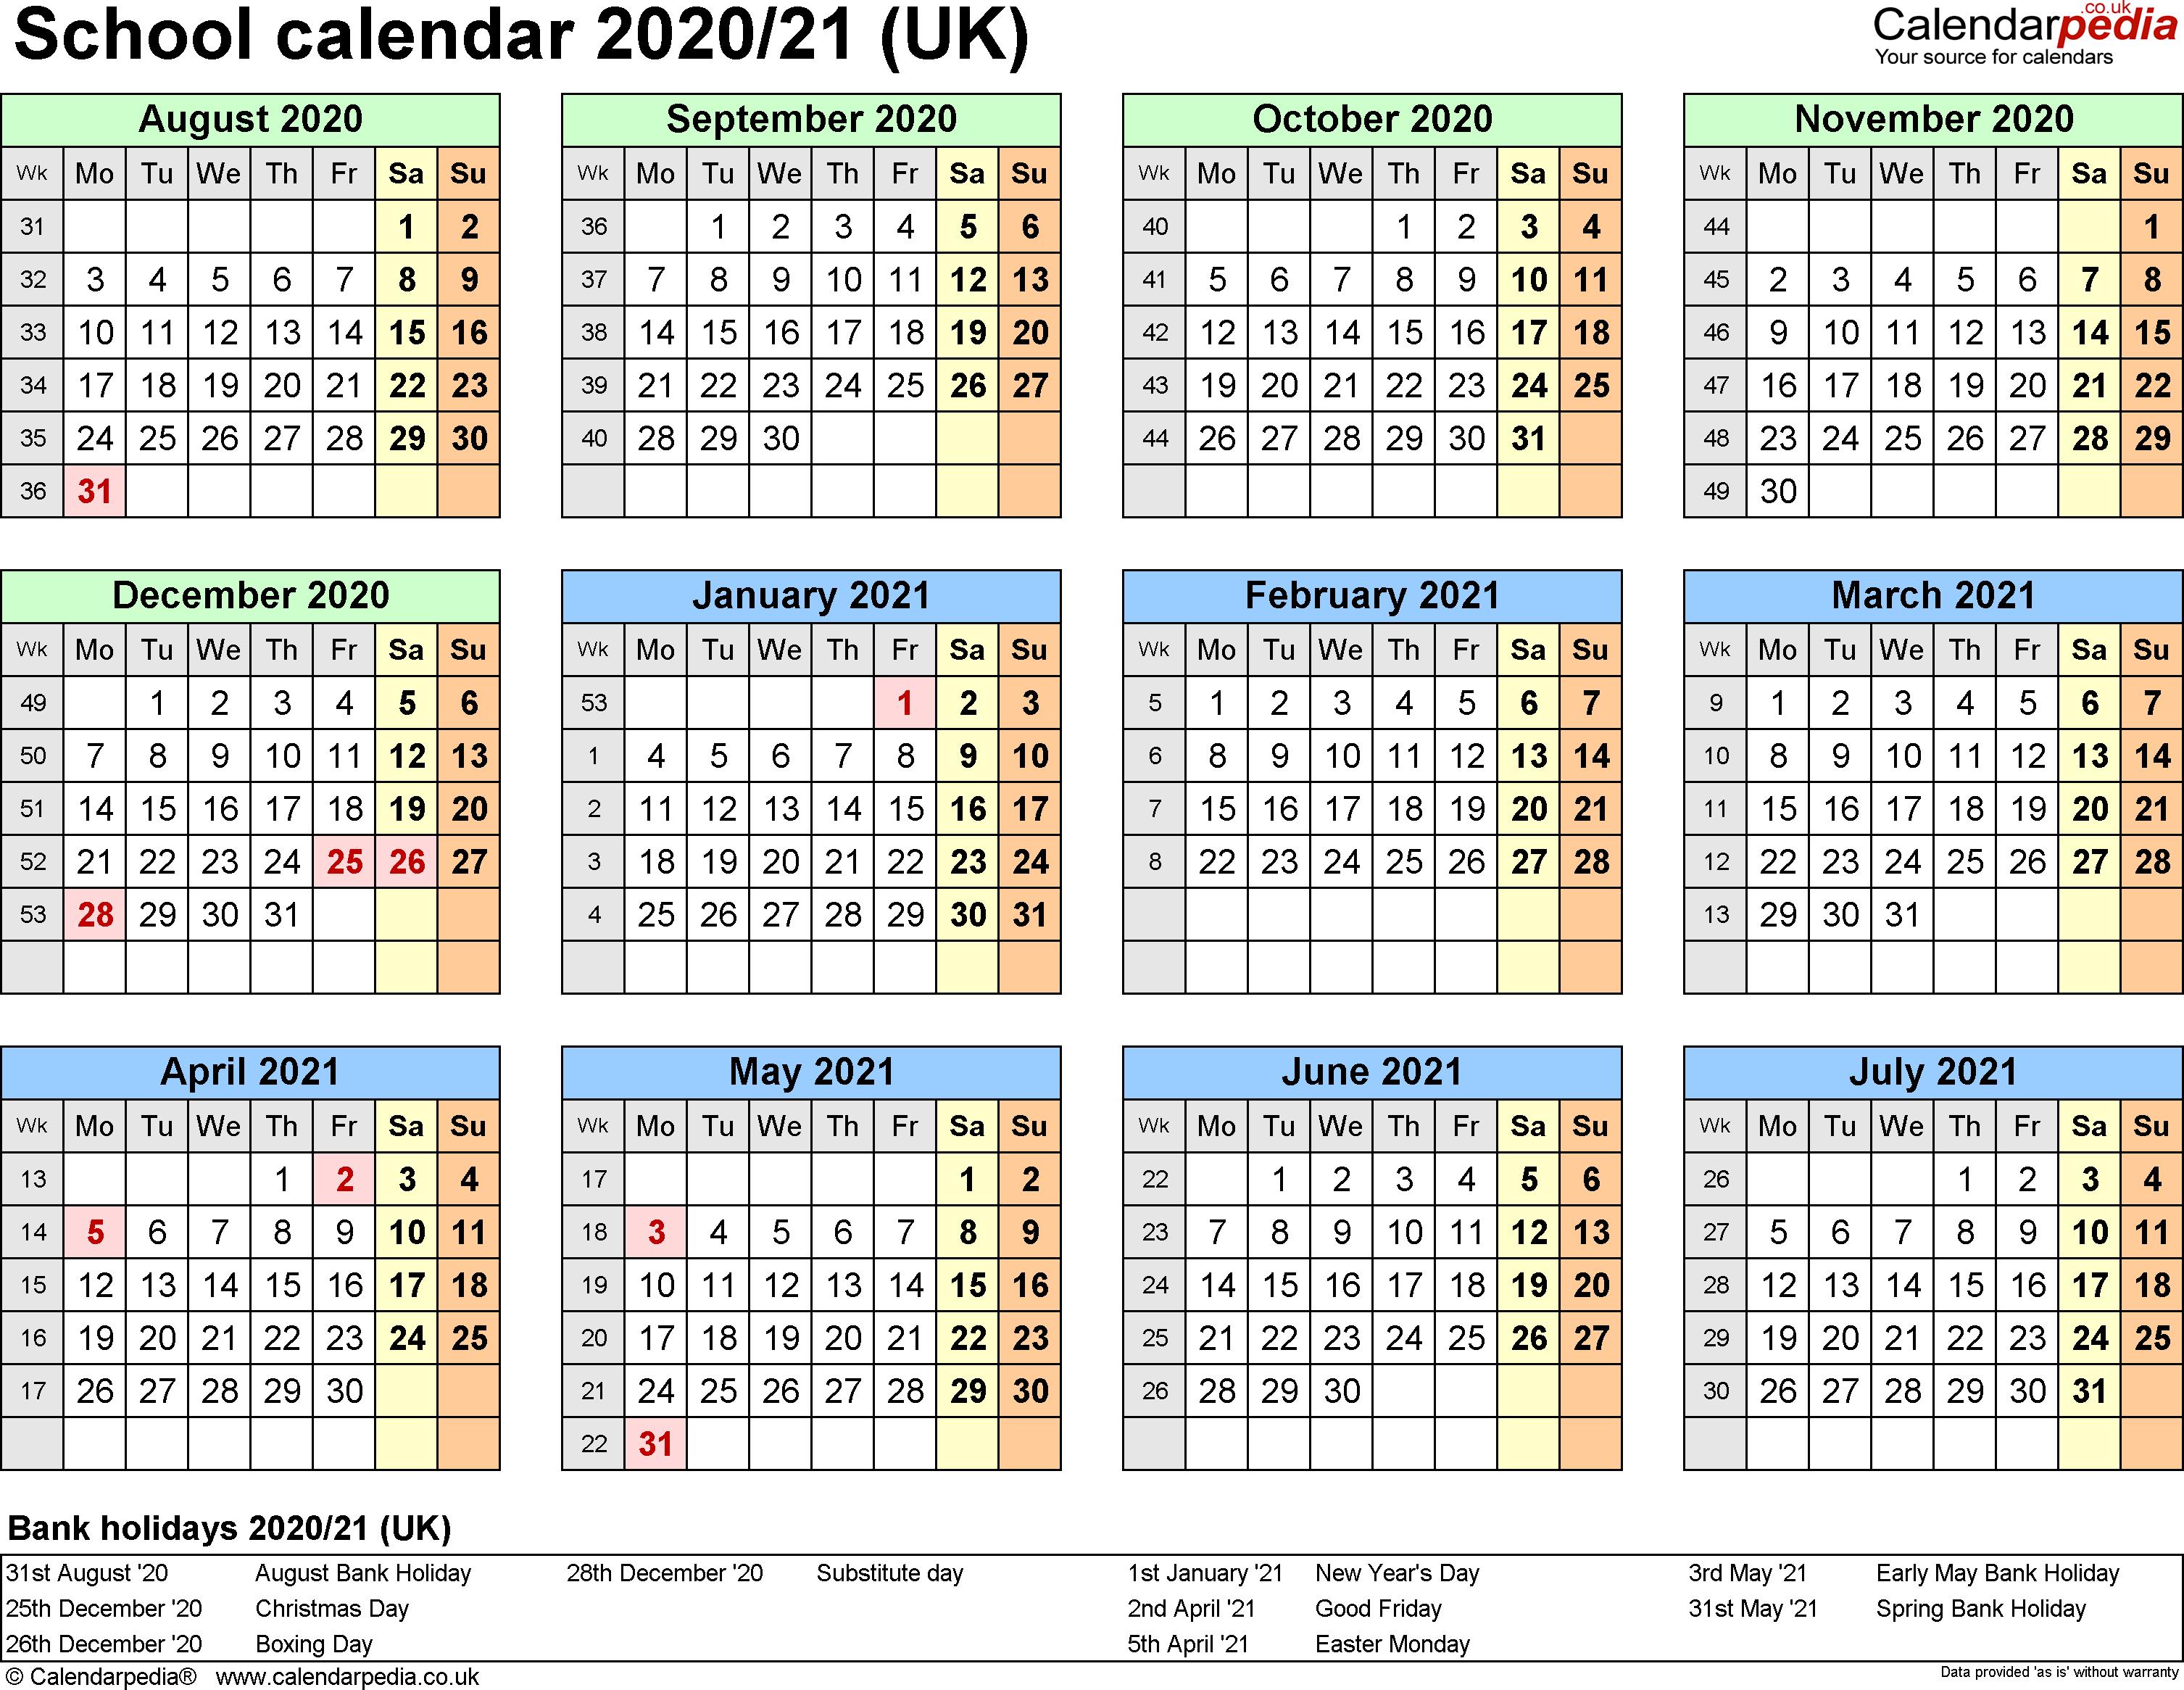 School Calendars 2020/2021 As Free Printable Pdf Templates